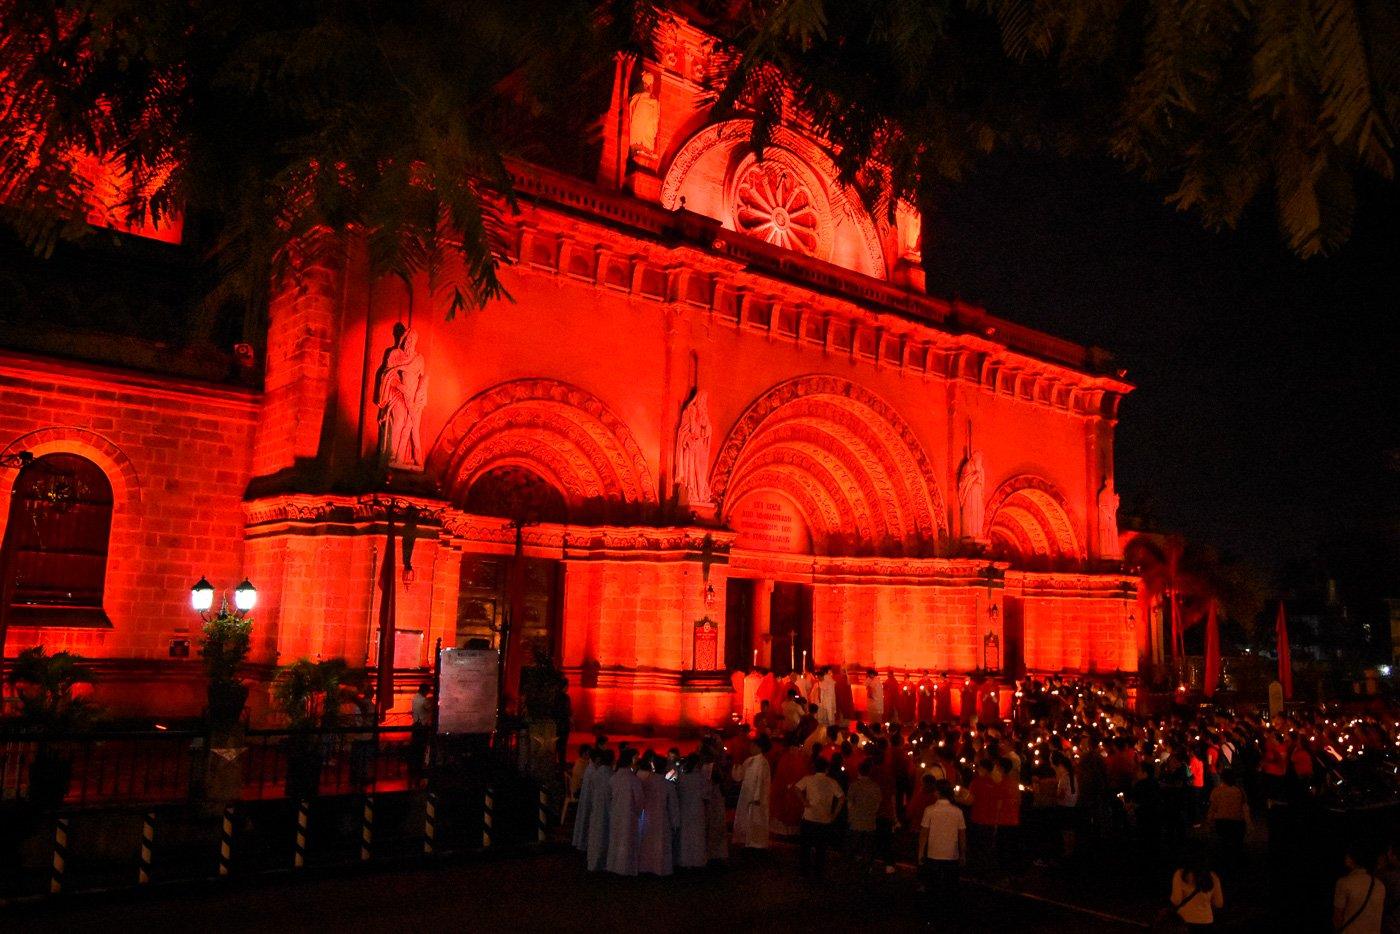 El próximo 27 de noviembre monumentos e iglesias de quince países se iluminarán de rojo para concienciar sobre la persecución de cristianos